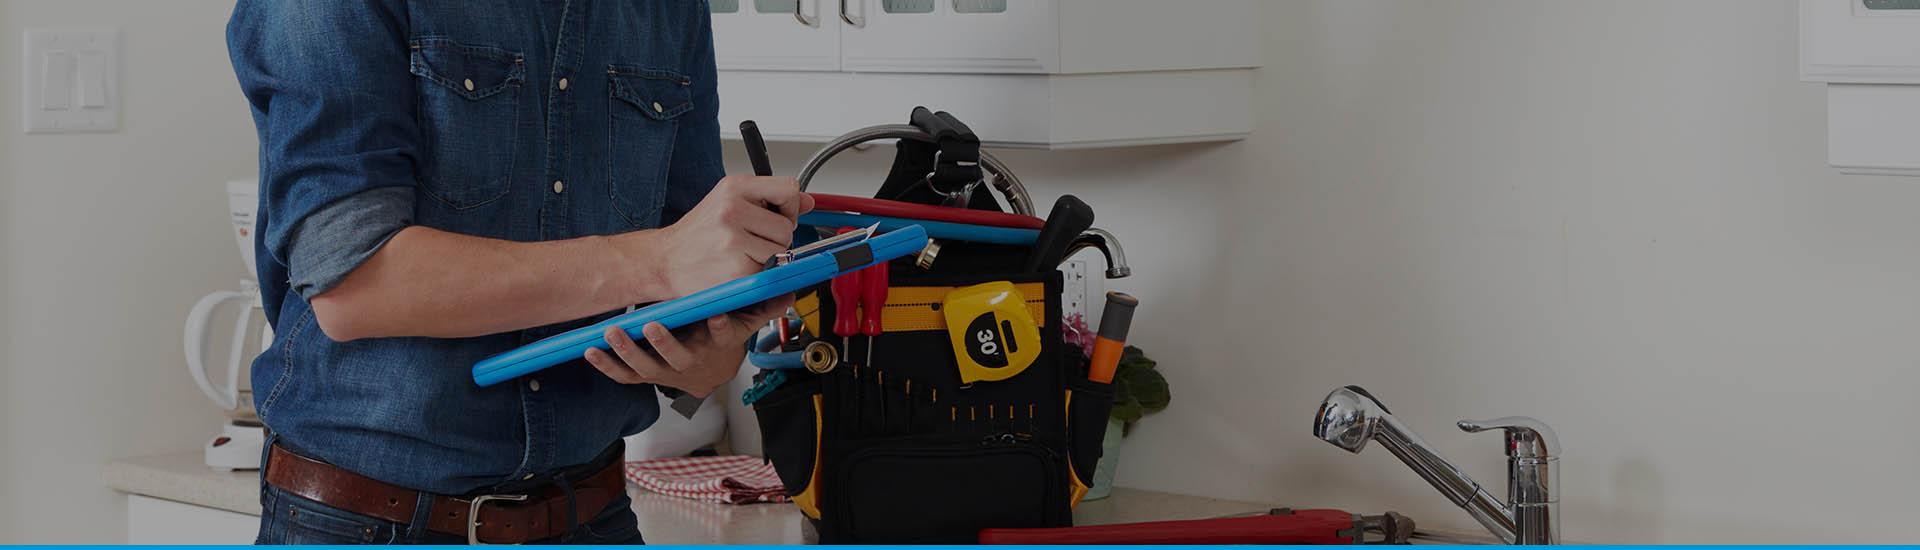 plumbing gas inspection